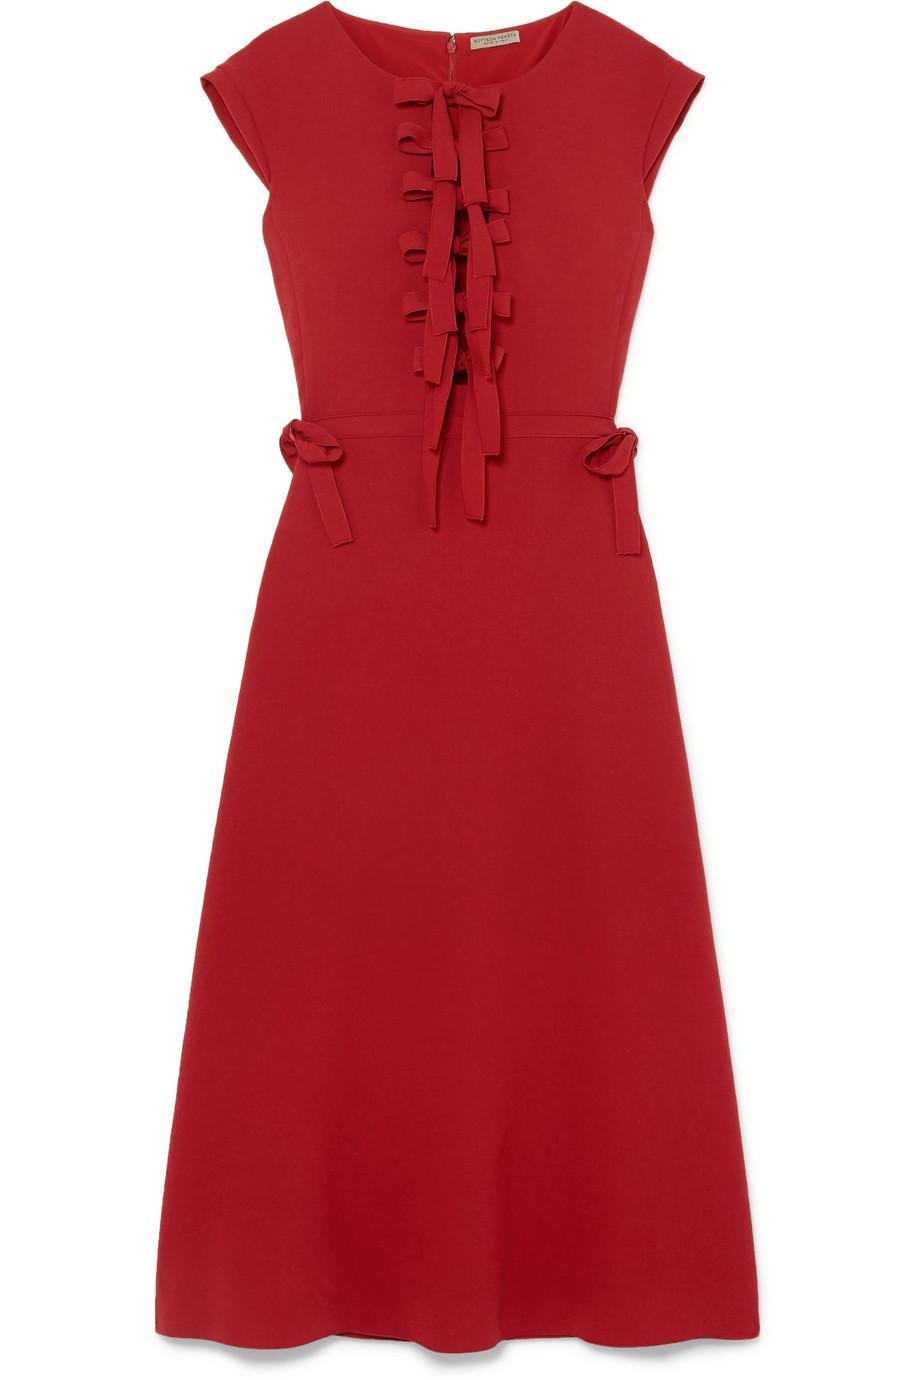 Bow-detailed Crepe Midi Dress - Red Bottega Veneta Amazing Price For Sale 4eyUu